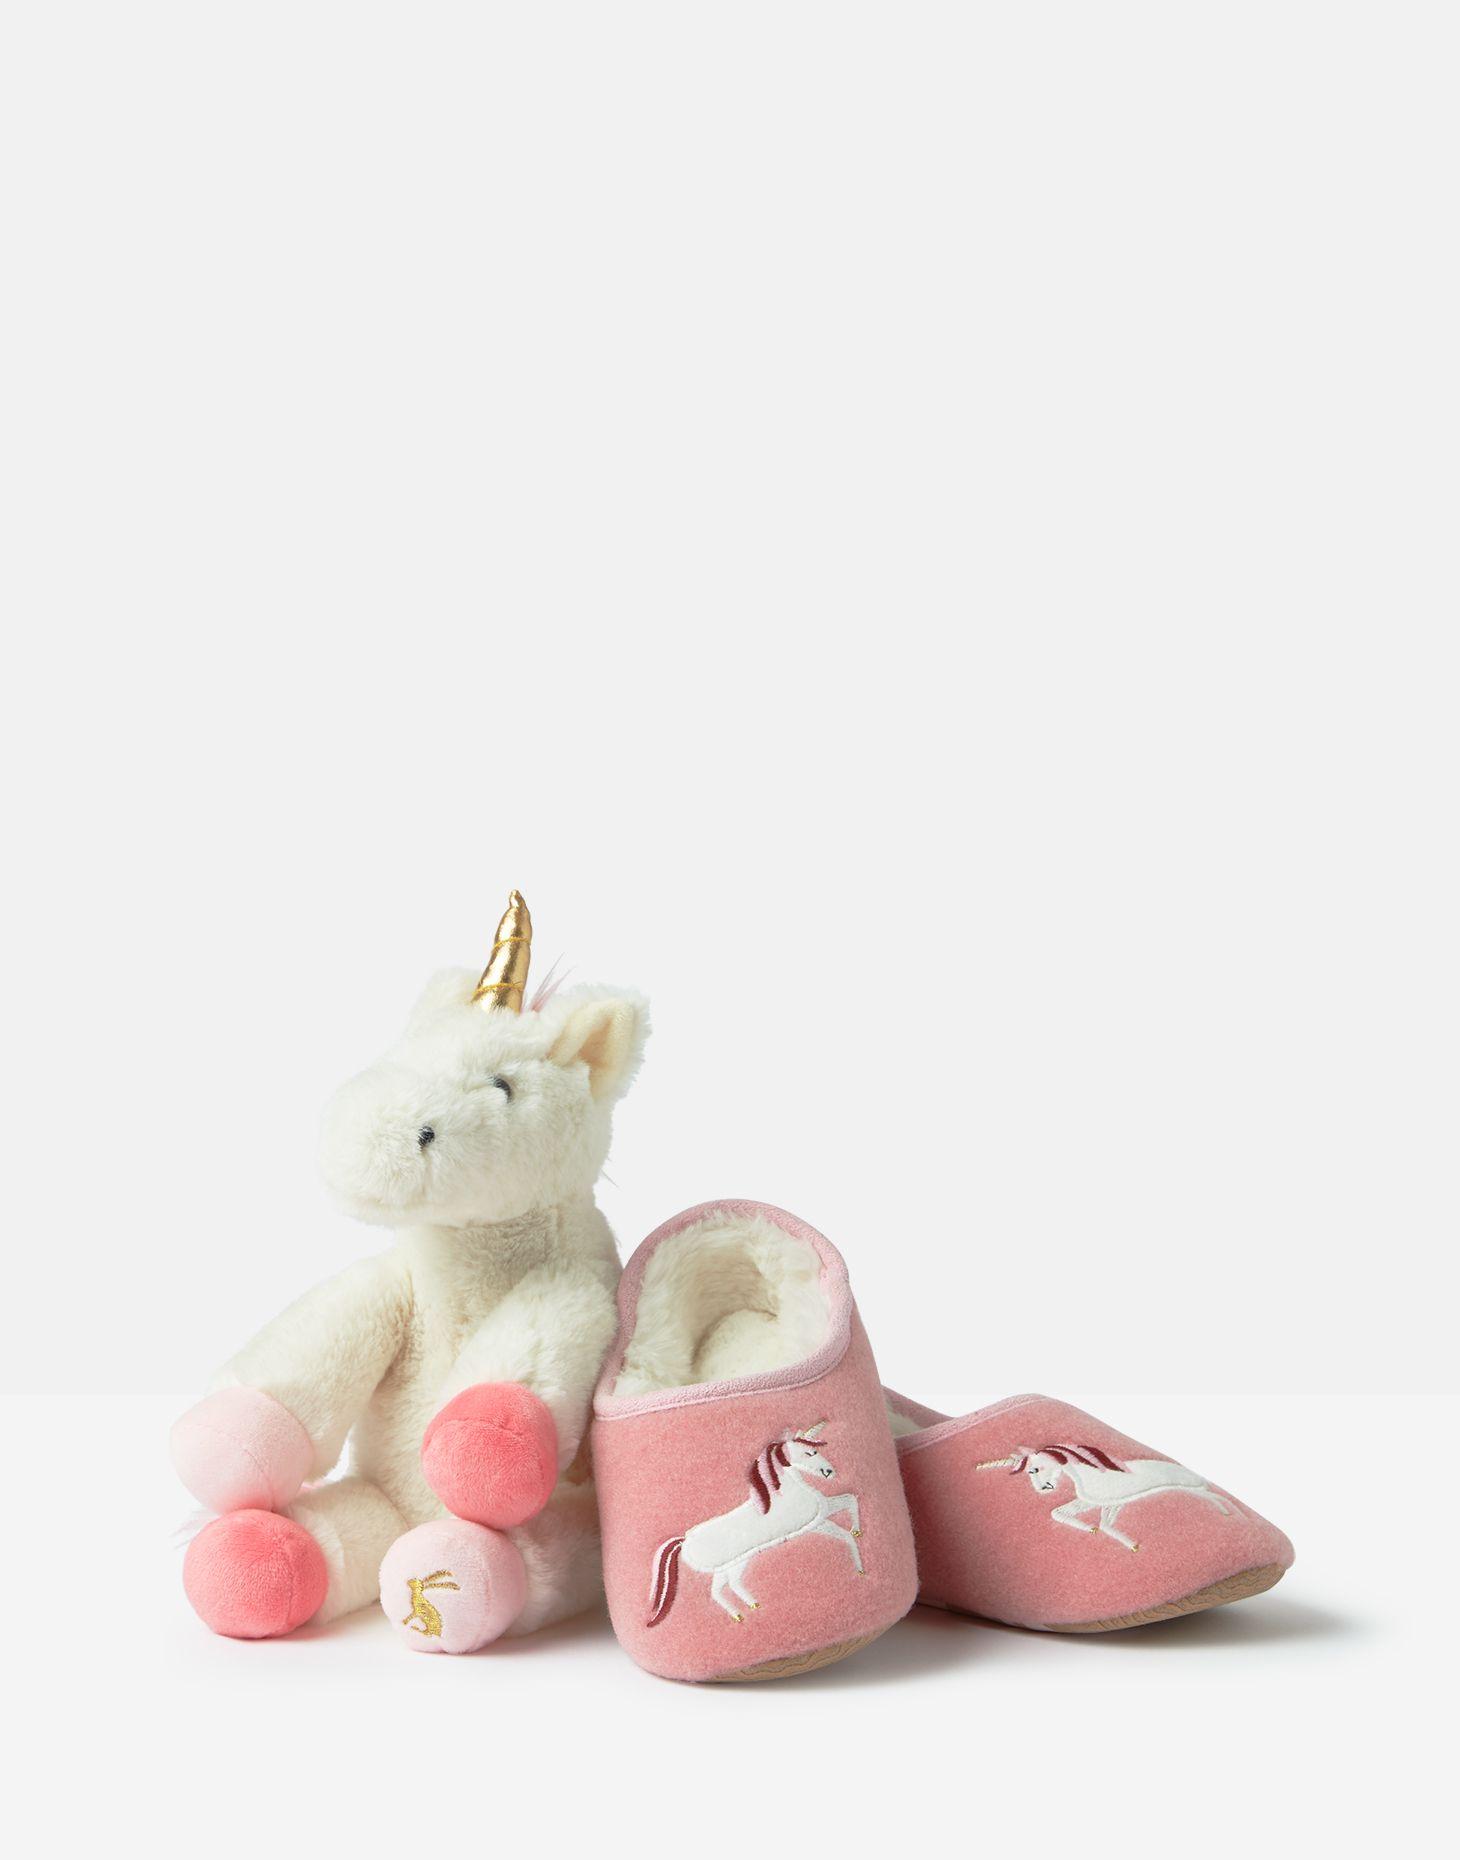 Ladies Unicorn slippers Novelty Gift Mule Ballet Pump Christmas